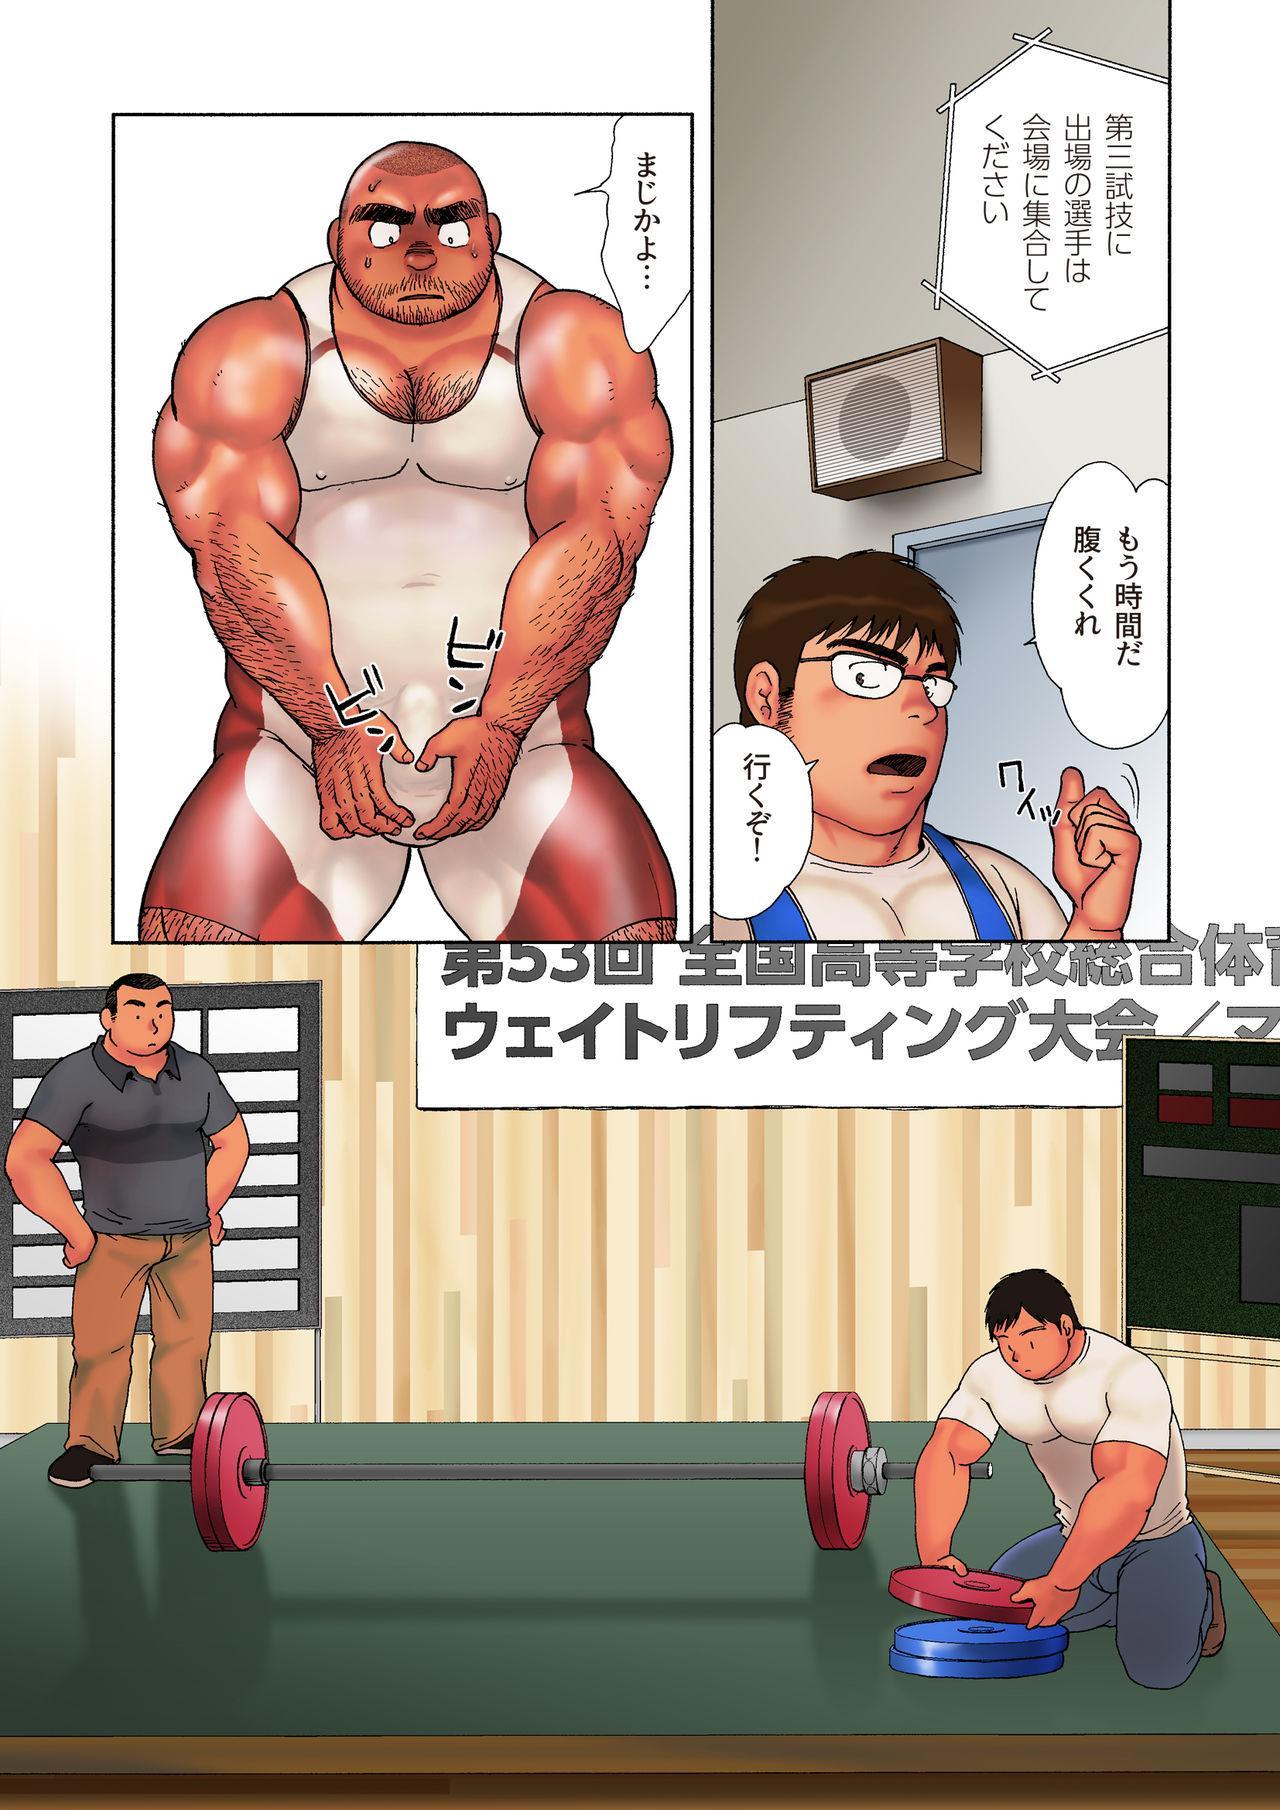 Danshi Koukousei Weightlifter Shiai-chuu, Osae kirenai Wakai Takeri 54